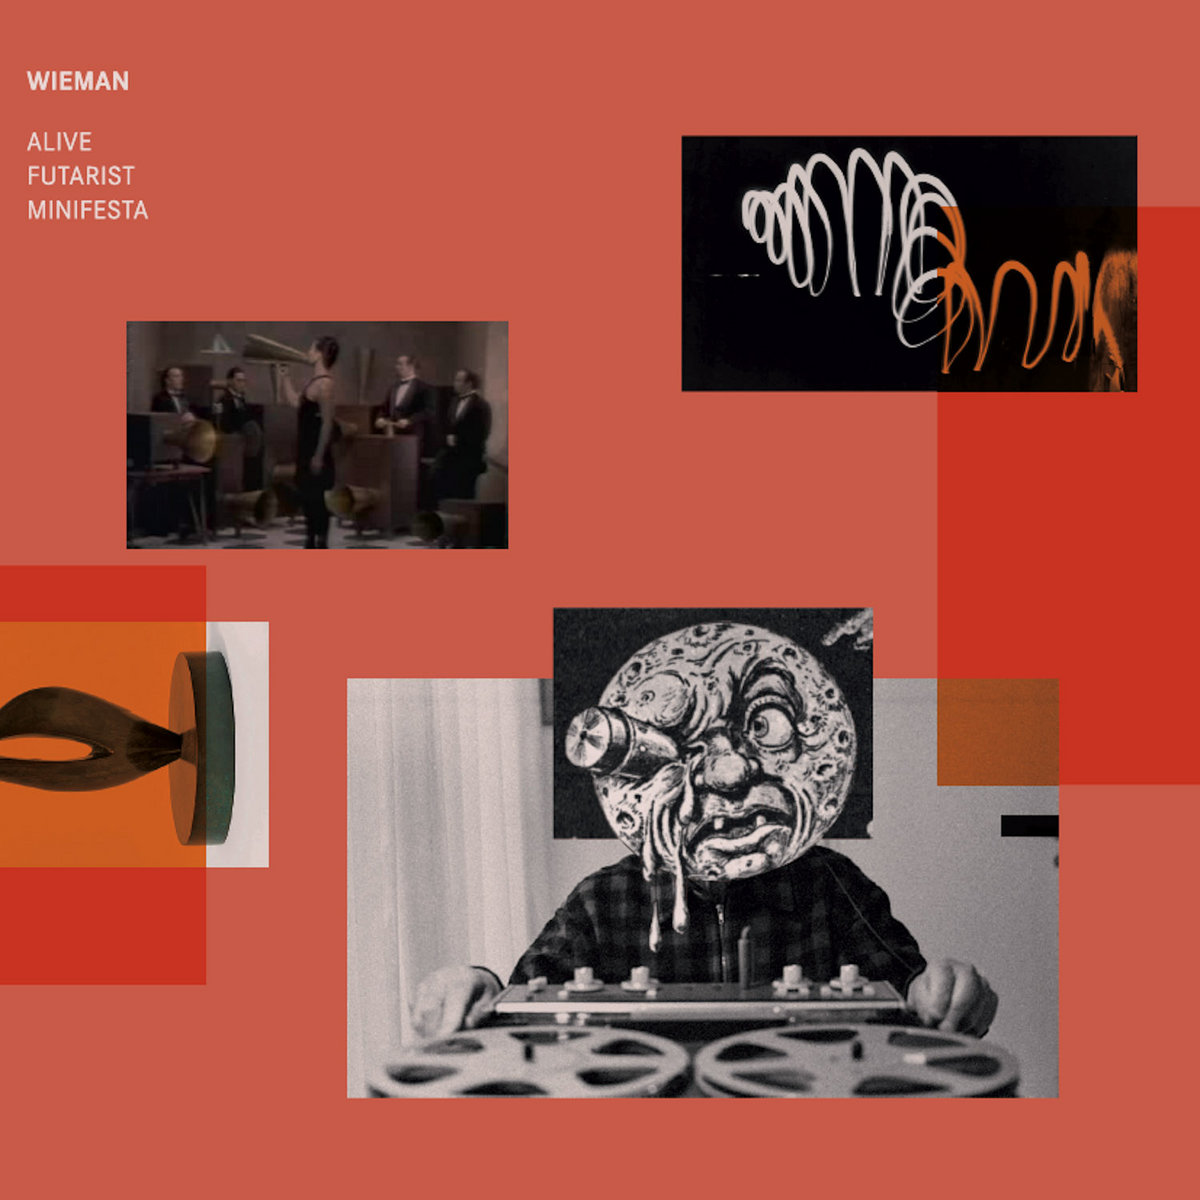 Berühmt Draht Discogs Galerie - Der Schaltplan - greigo.com